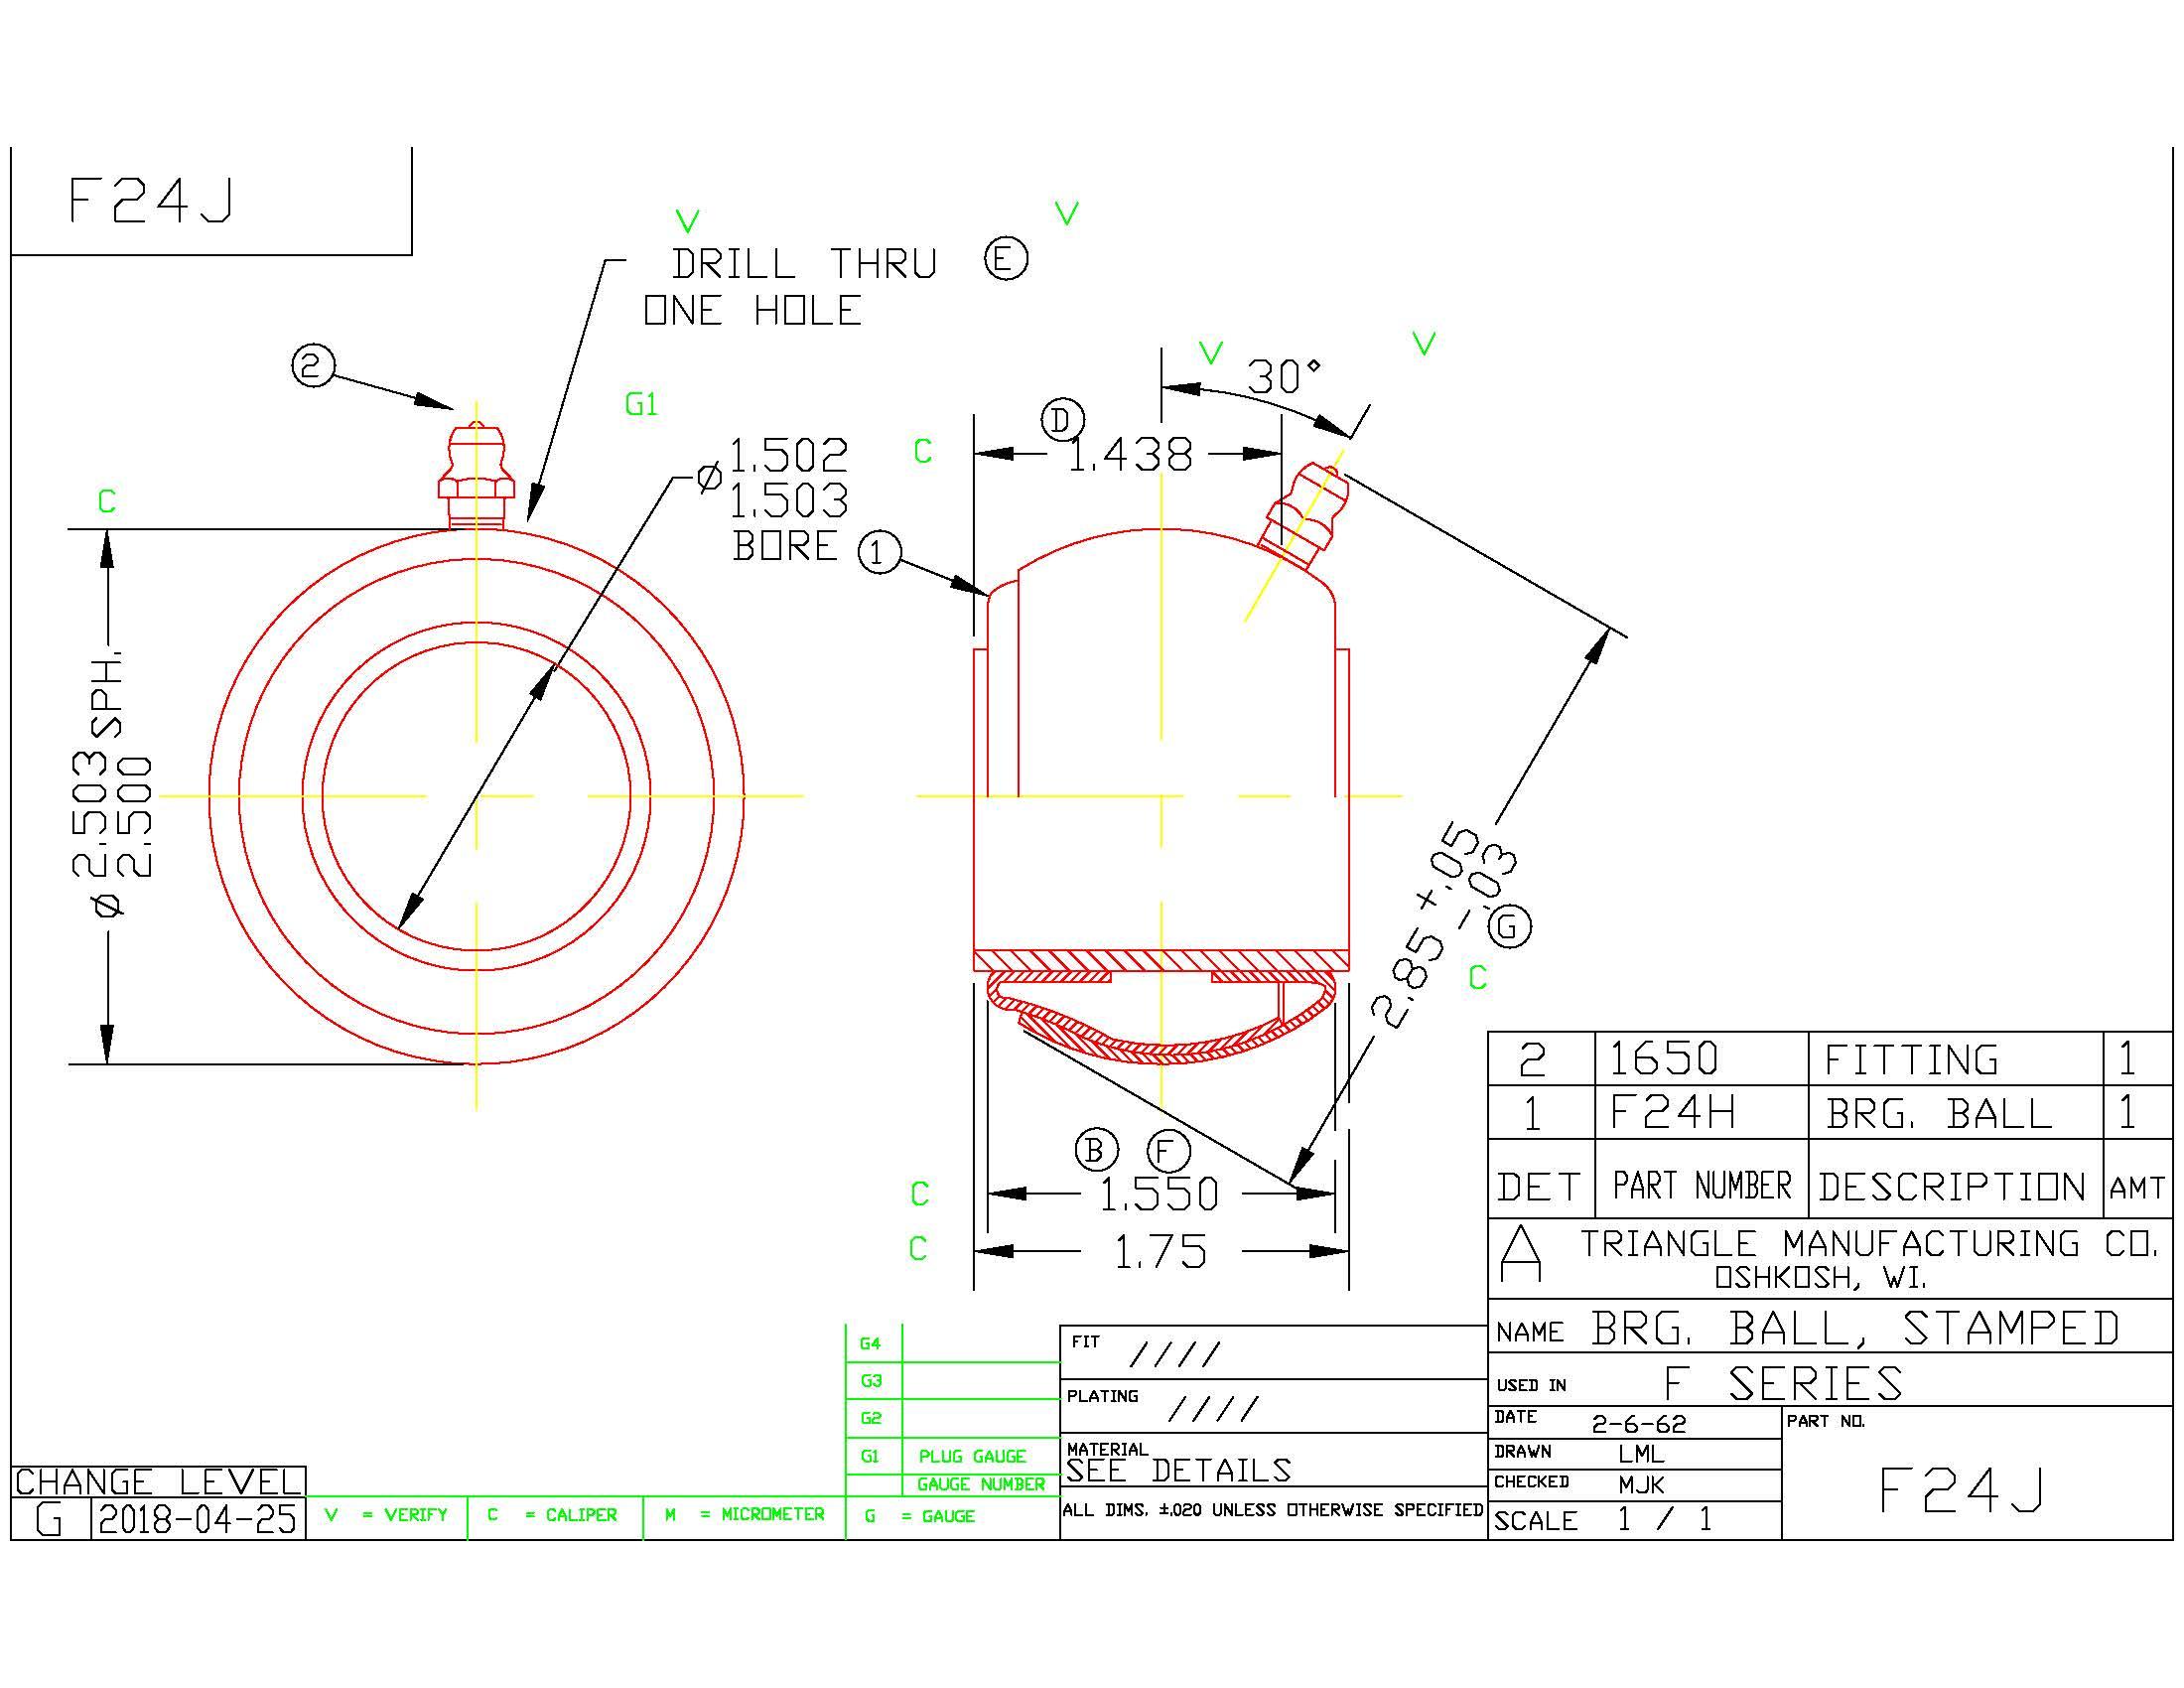 Spherical Plain Bearing F24J